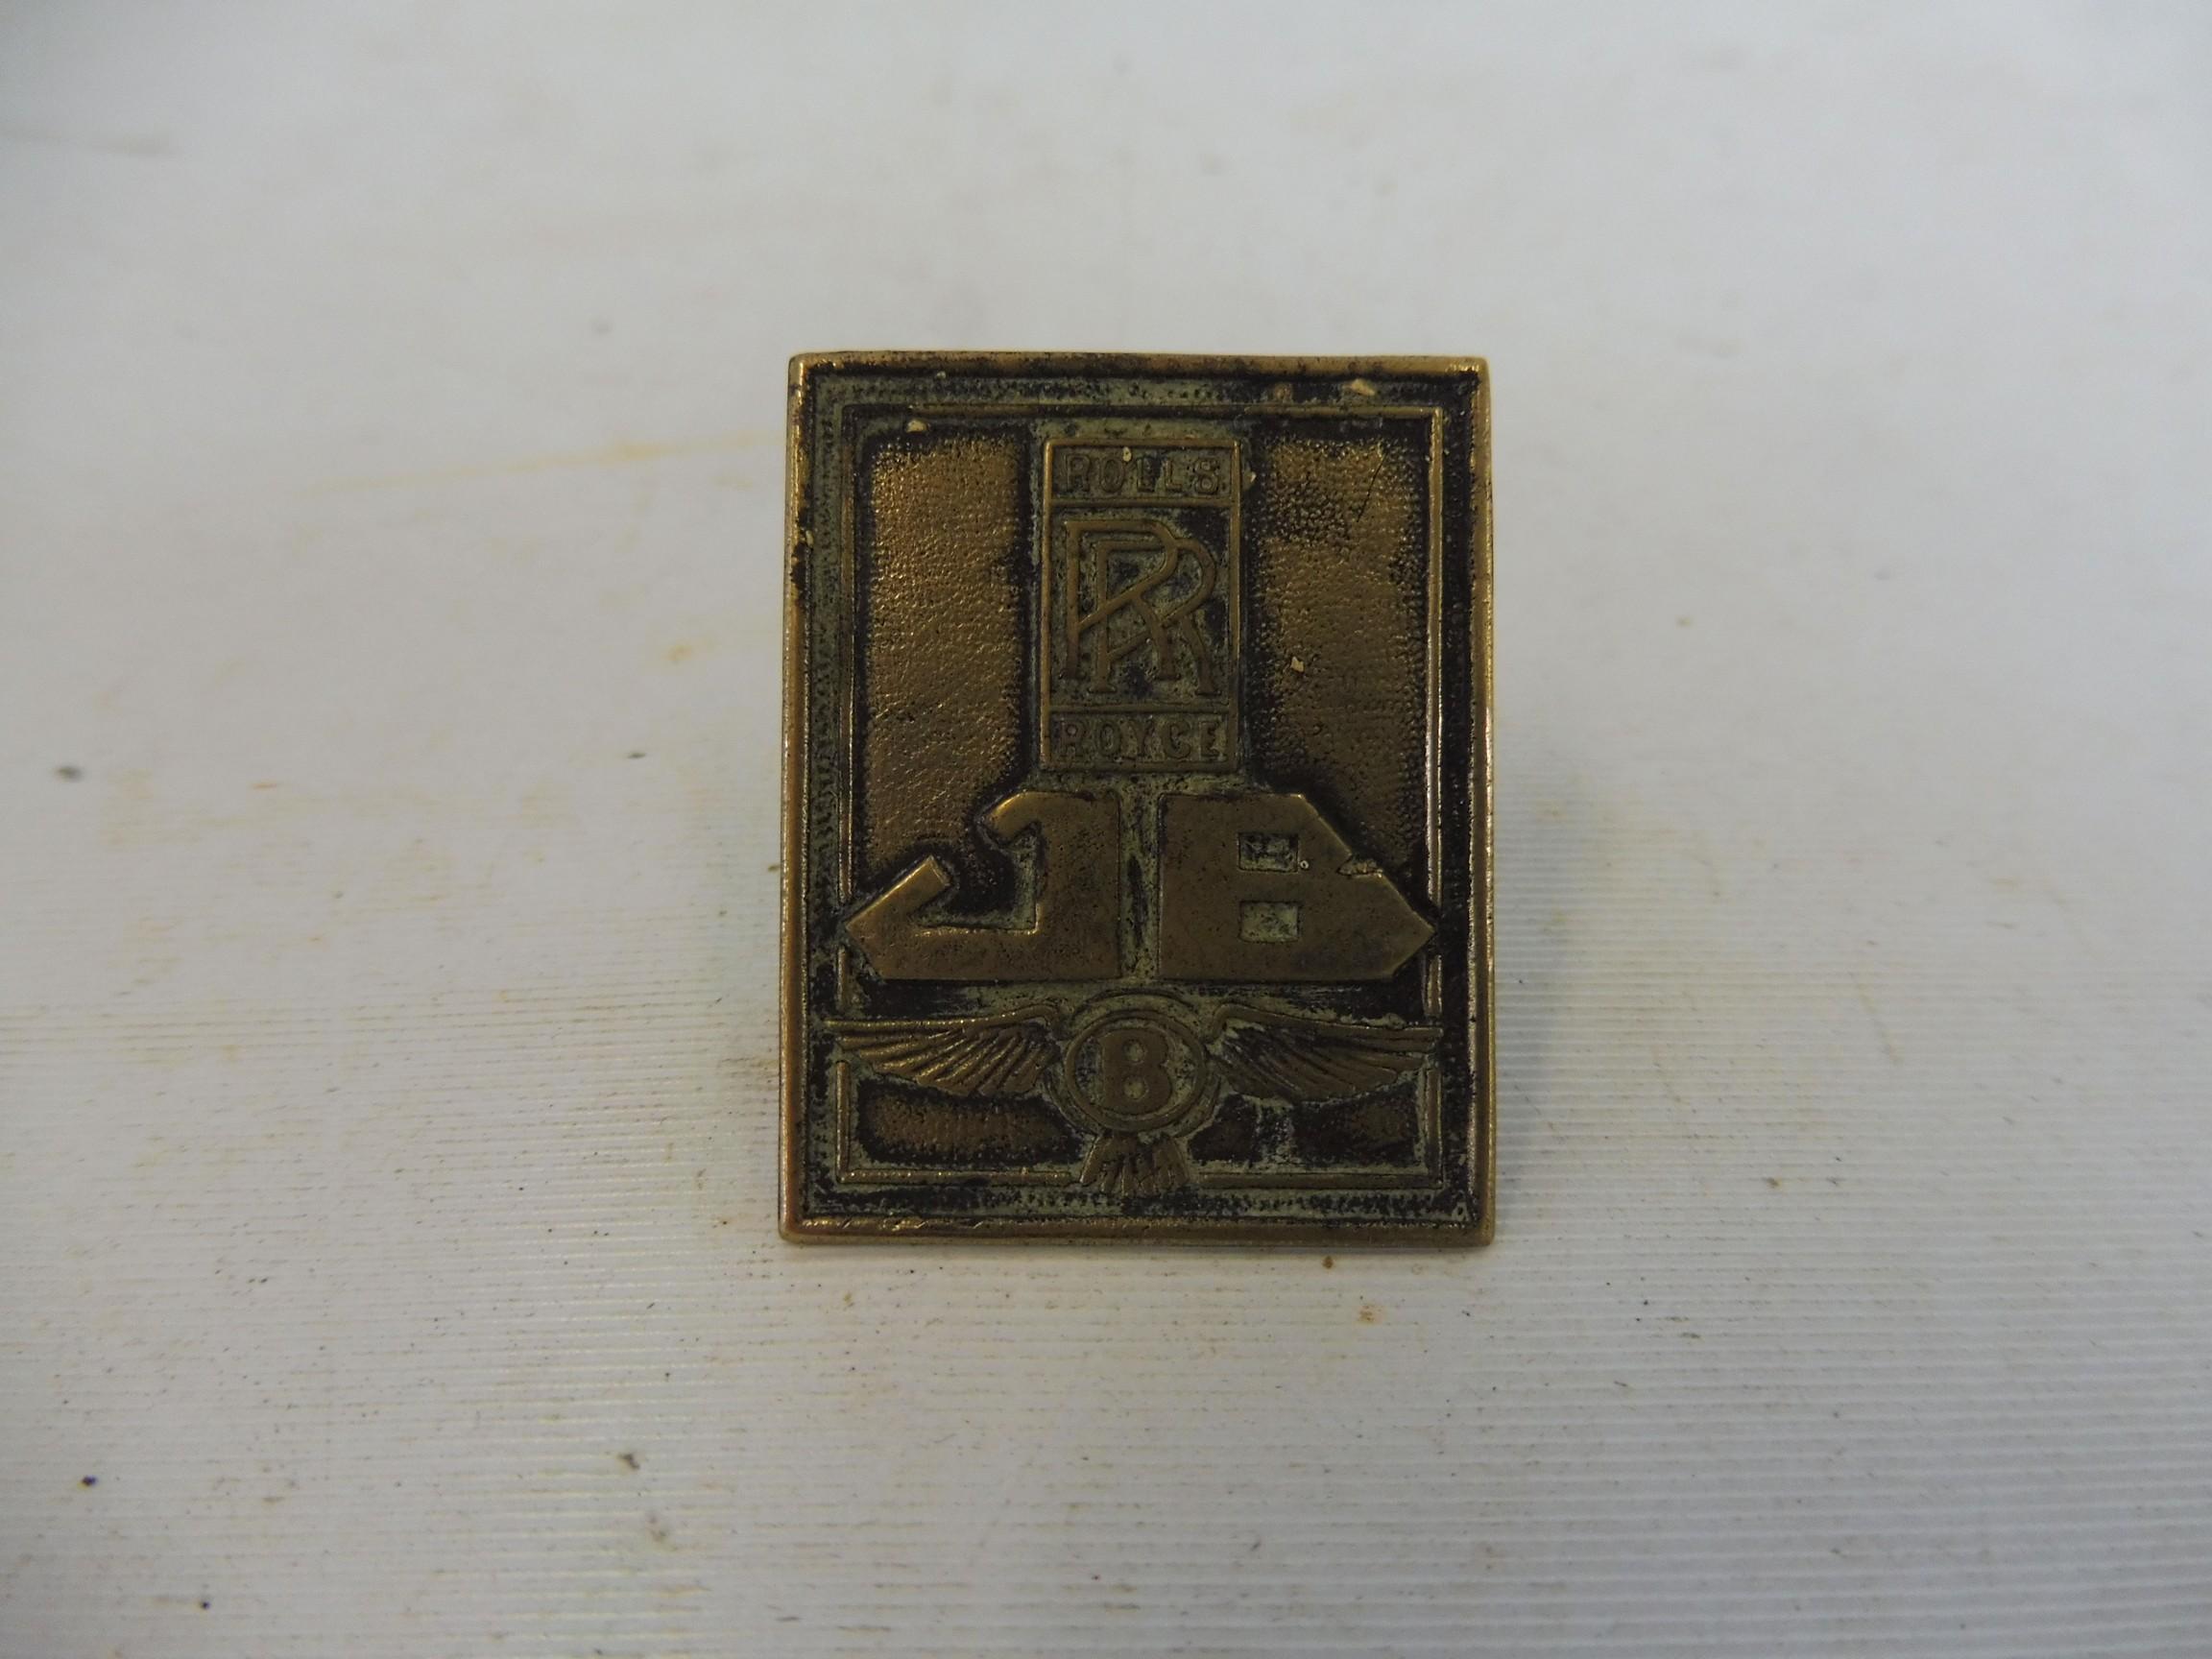 A JB Jack Barclays RR Rolls-Royce brass badge.